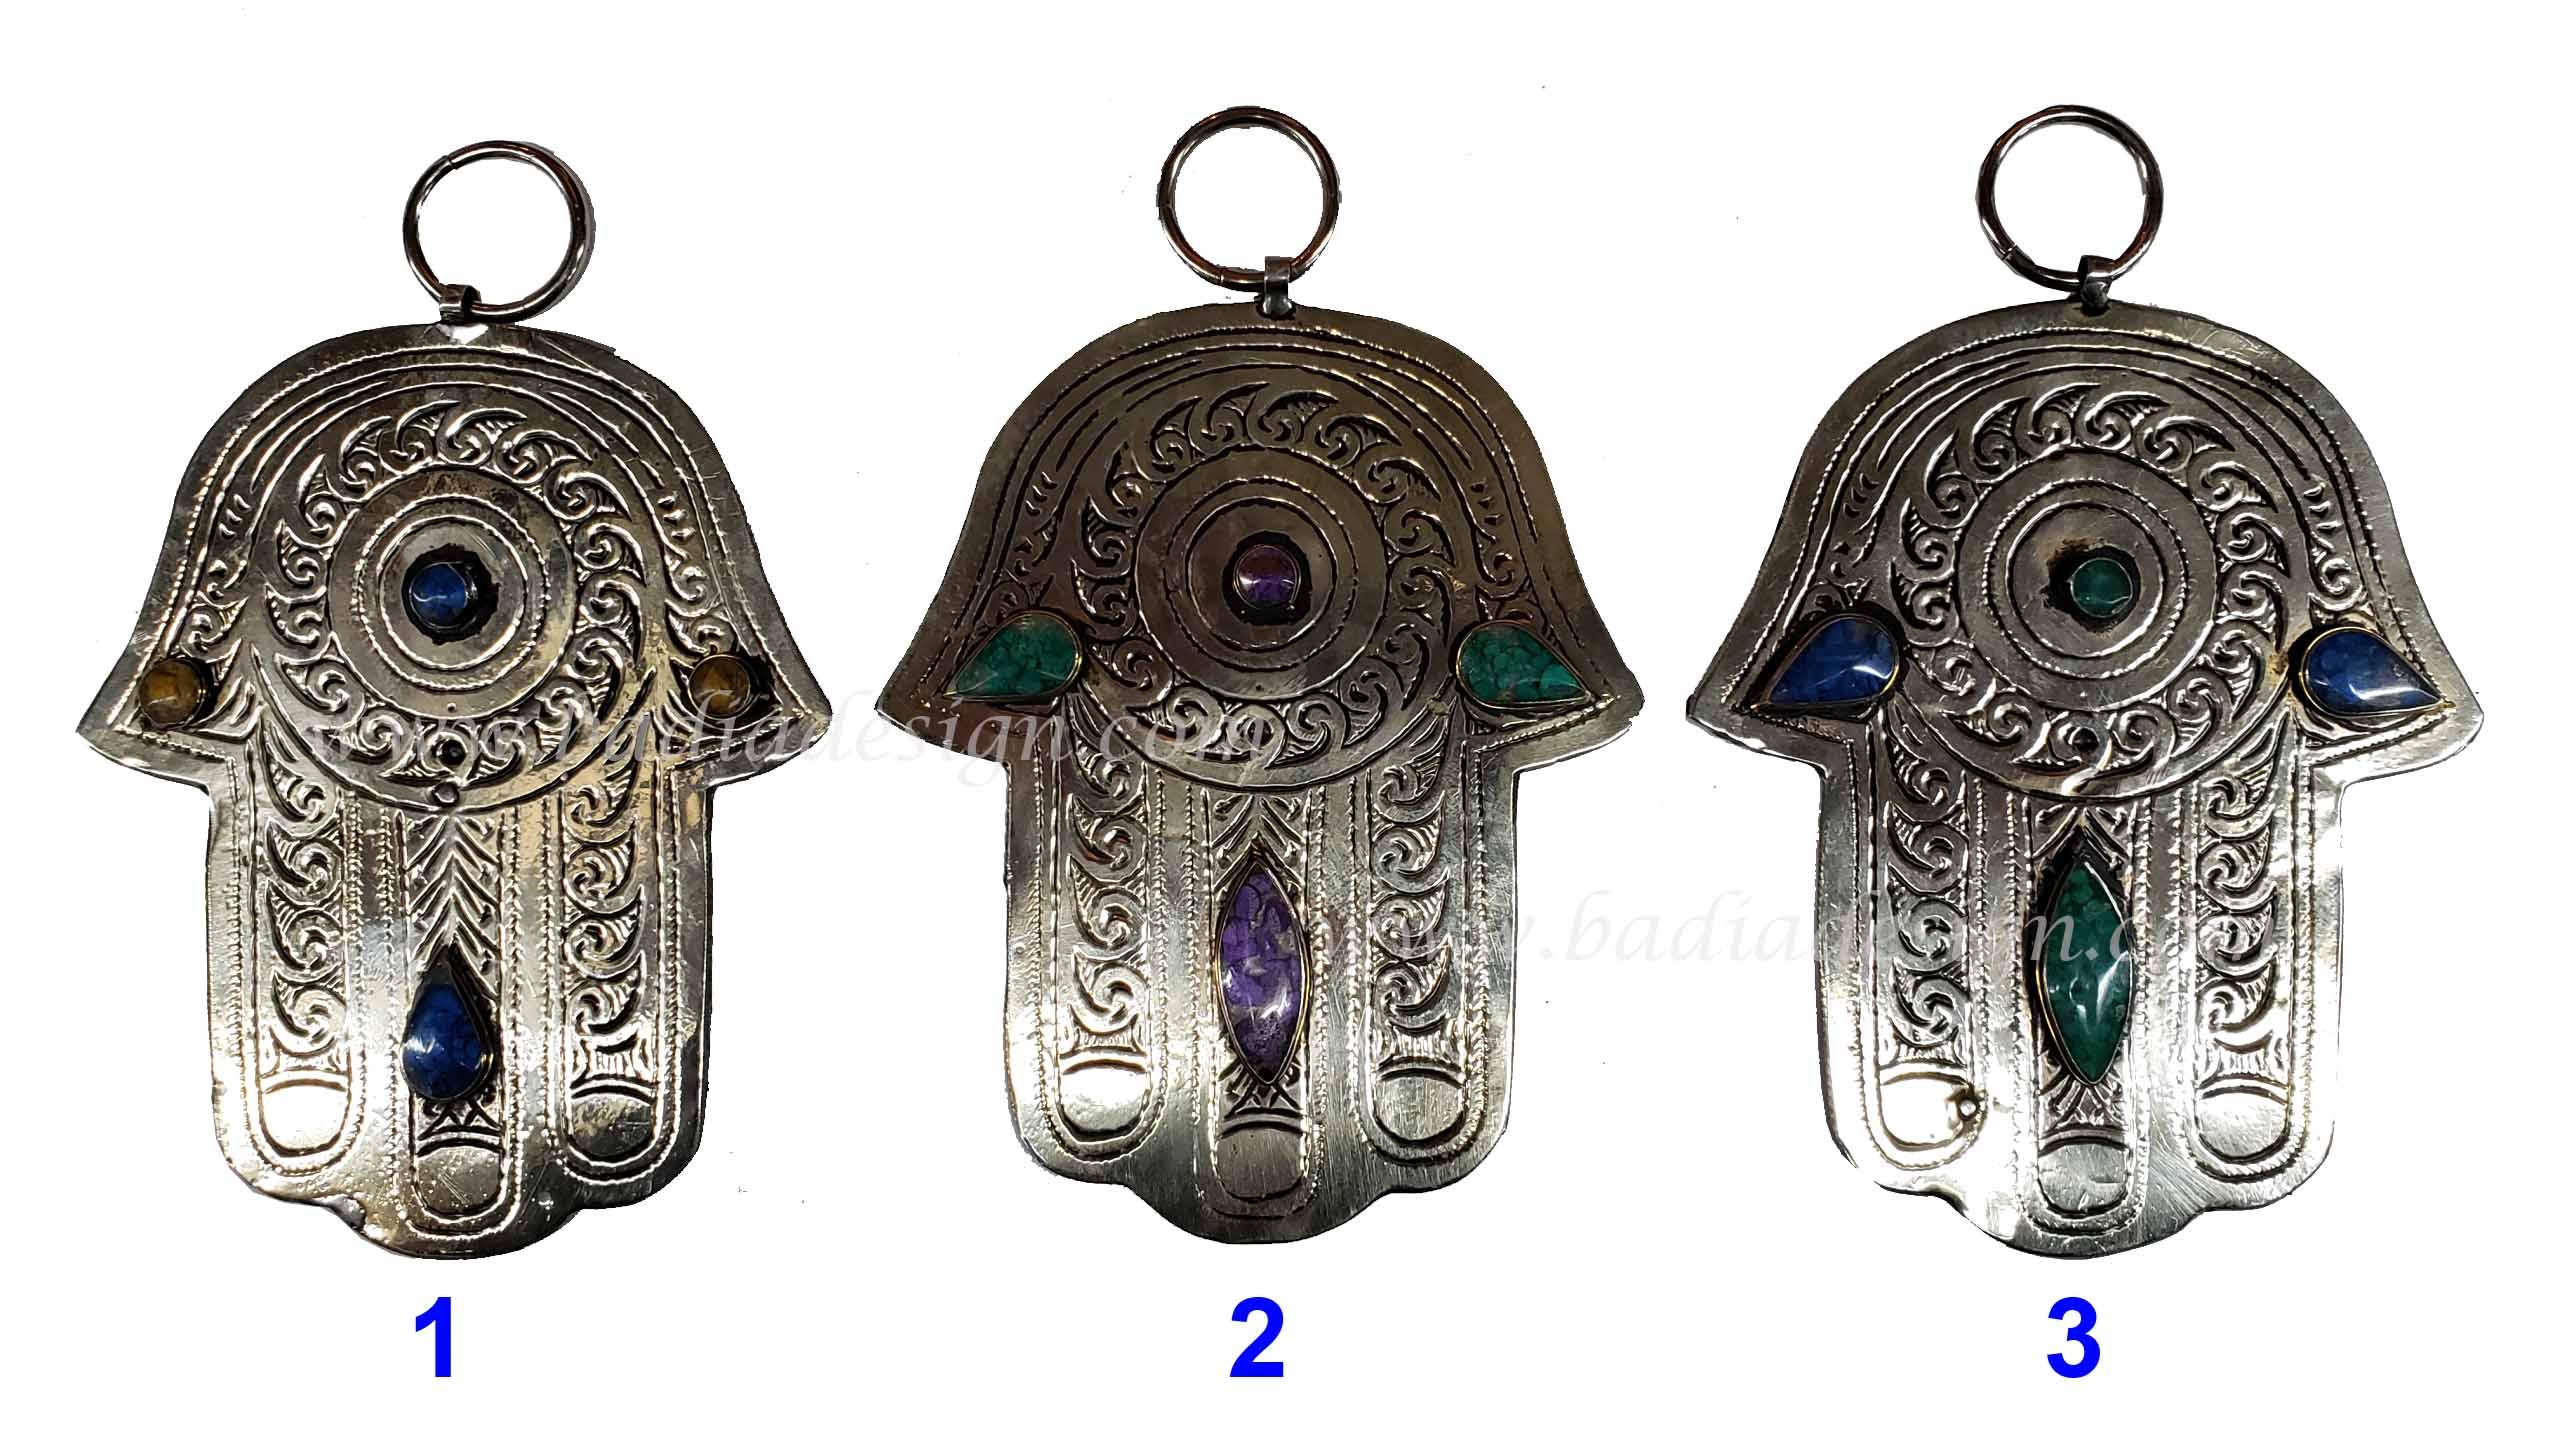 khamsa-hand-of-fatima-pendant-hd189.jpg